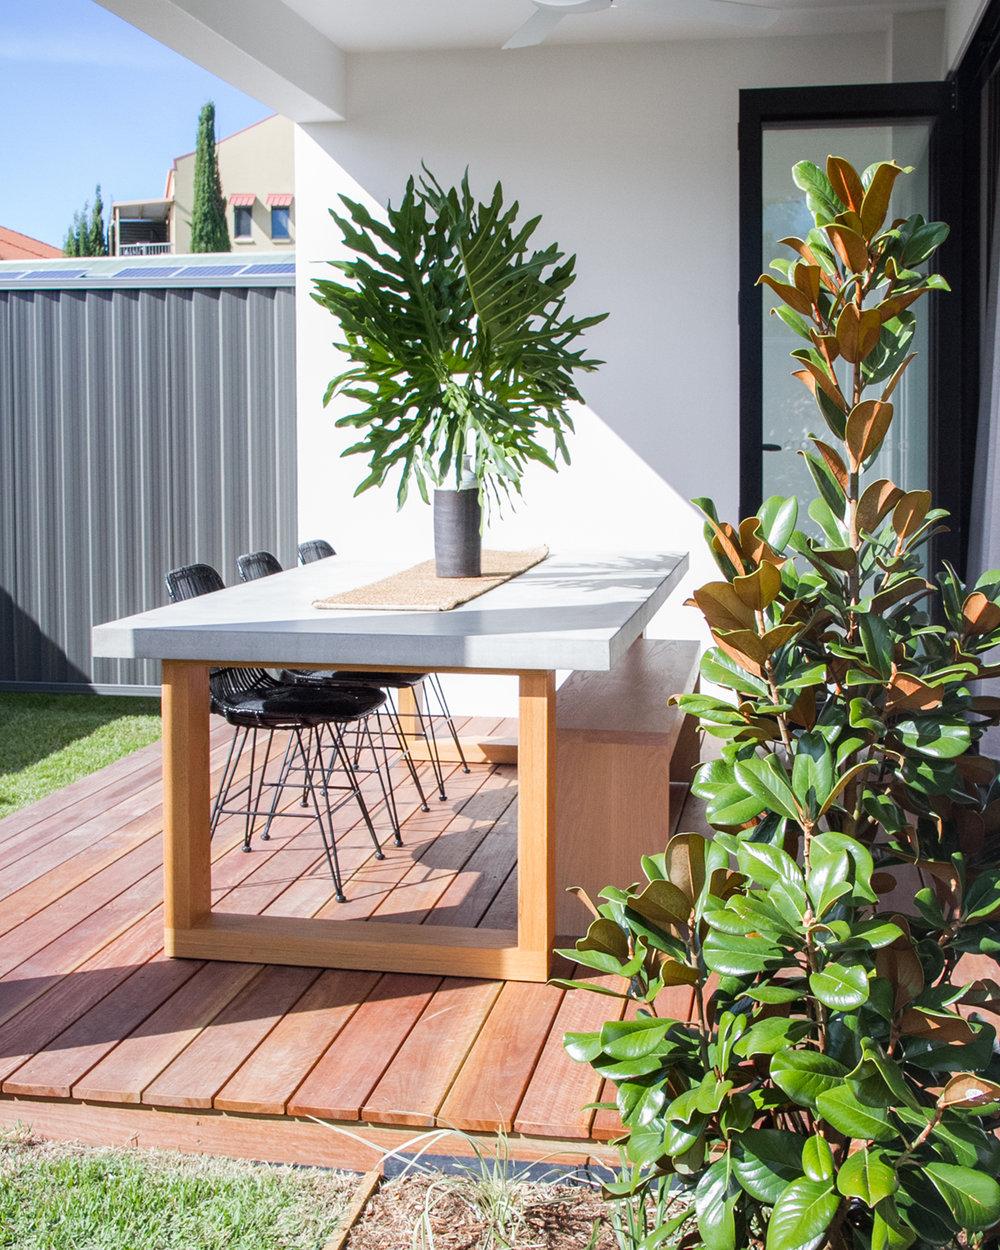 Kira and Kira - Gold Coast Property Styling - Home Interiors - Furniture DesignKira and Kira Gold Coast Property Styling Home Furniture IMG_6101 - small.jpg